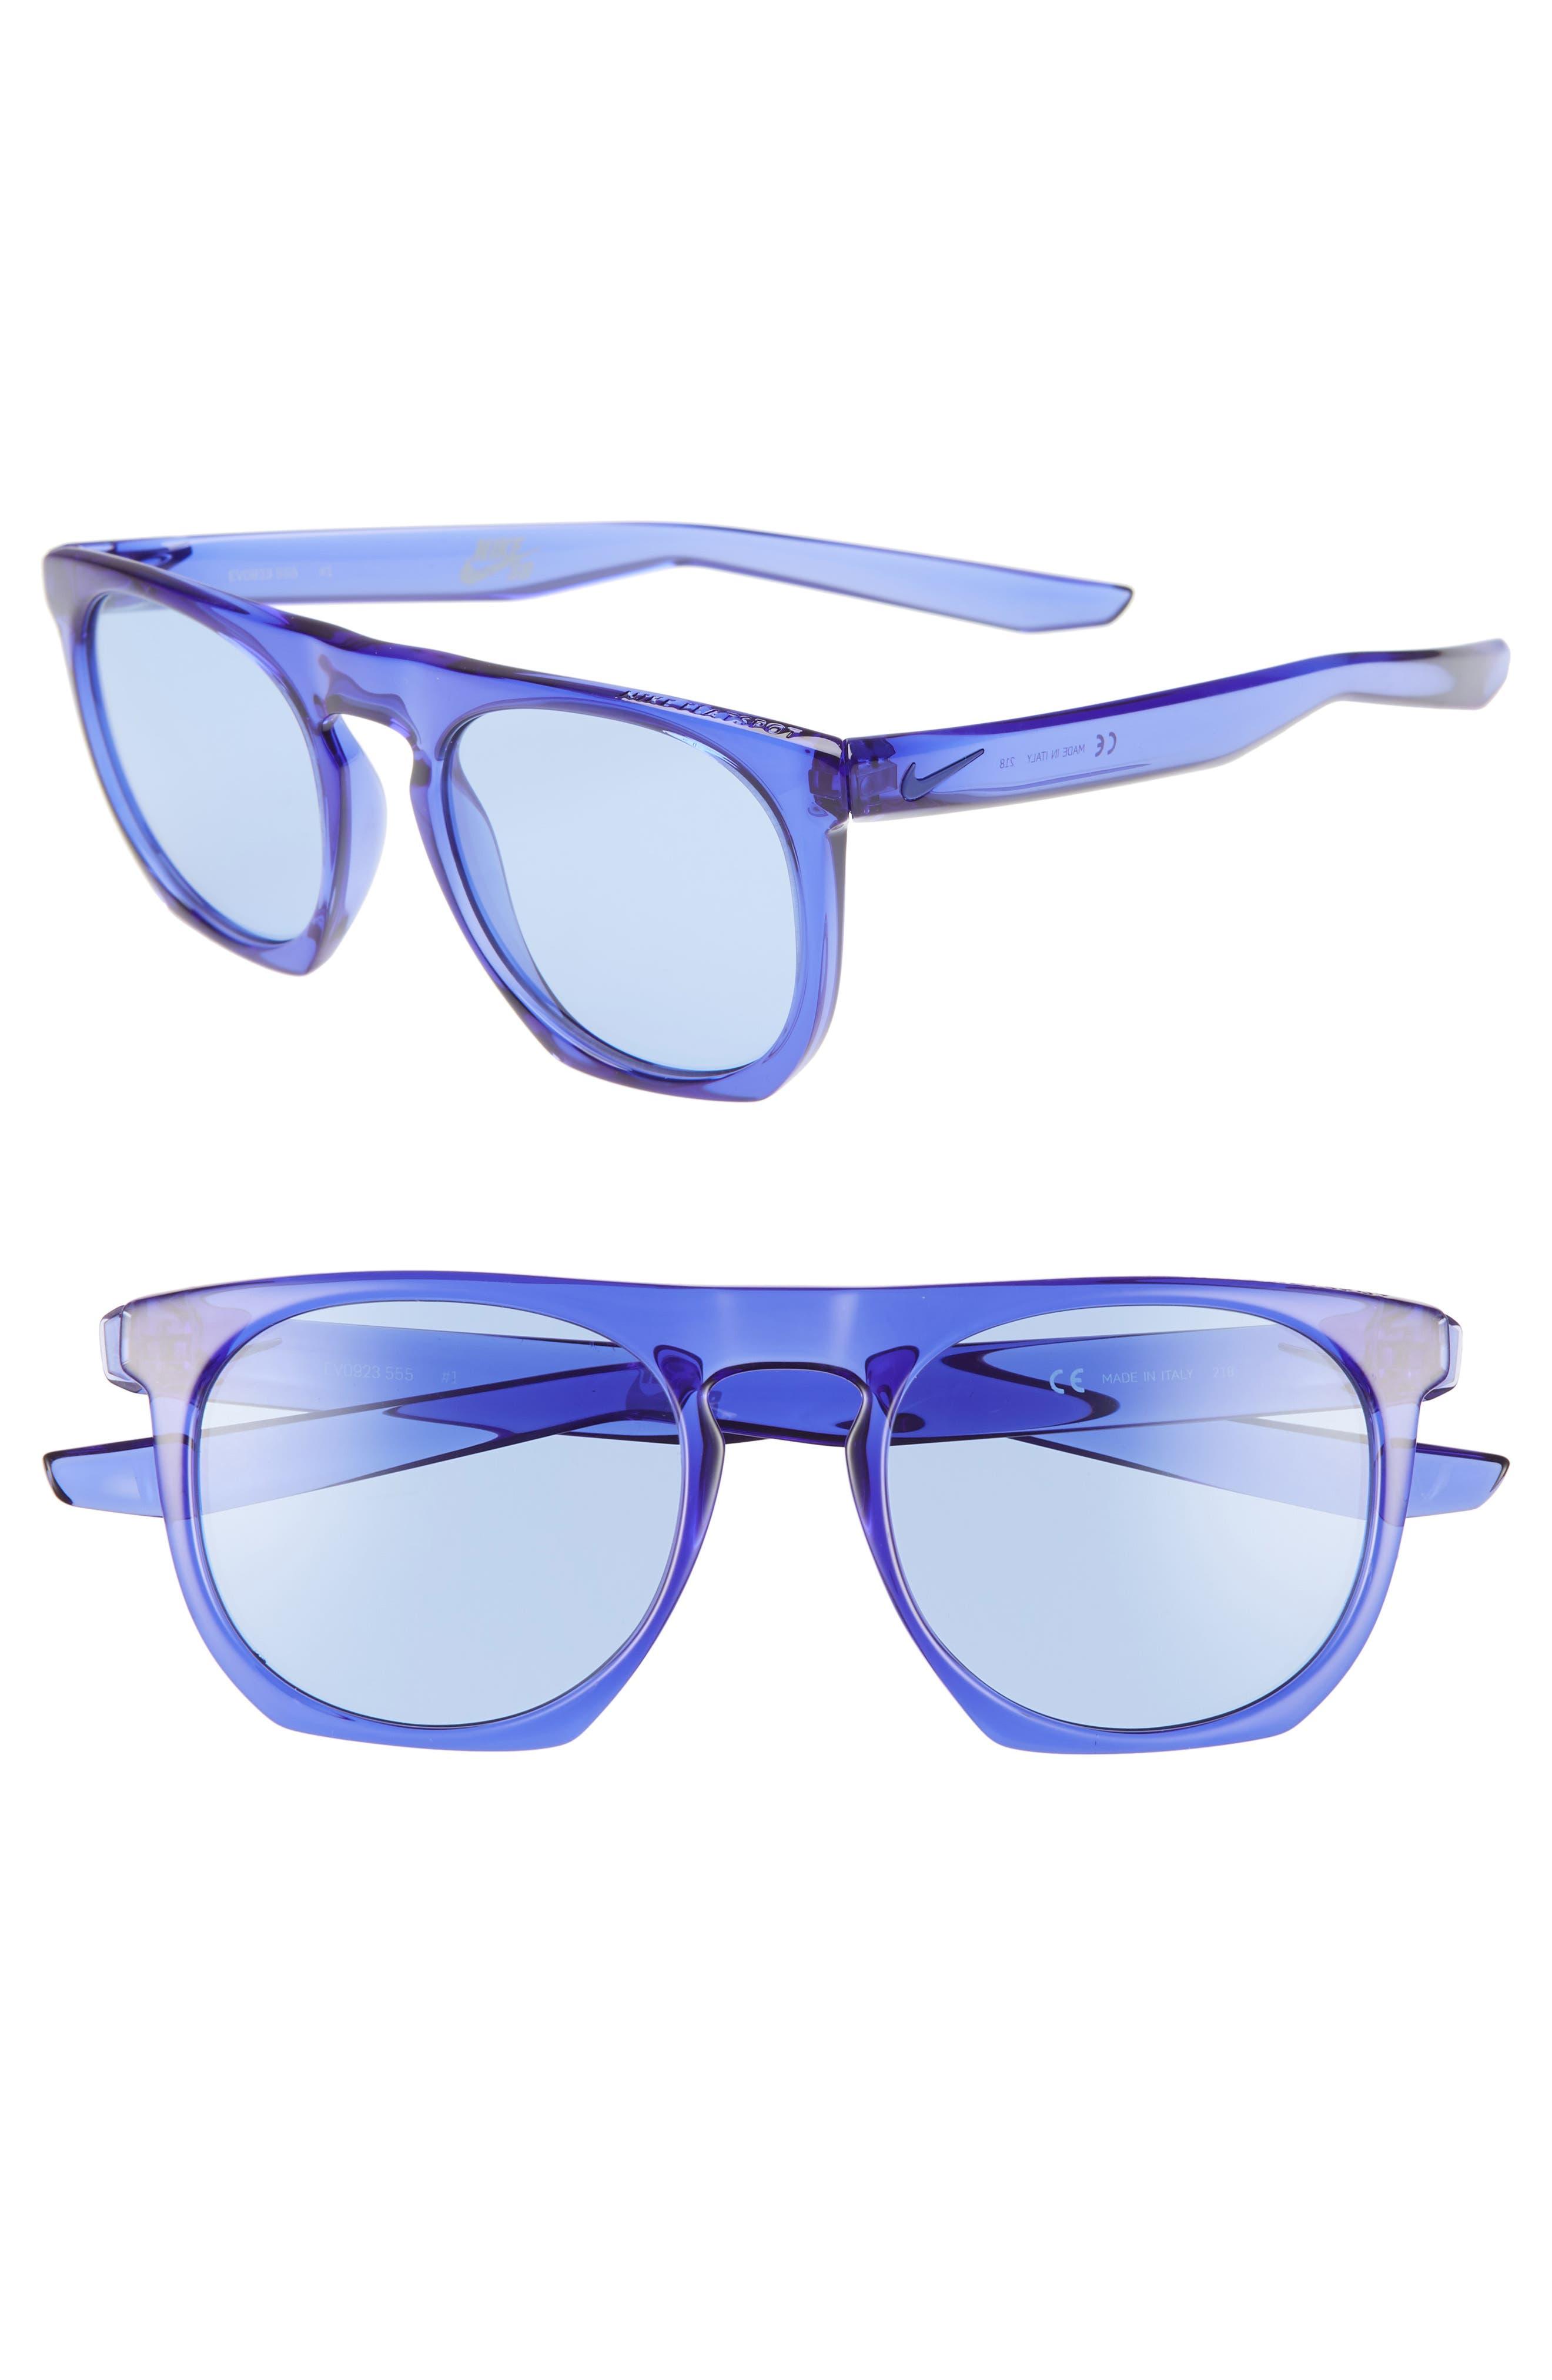 Nike Flatspot 52Mm Flat Top Sunglasses - Violet/ Violet